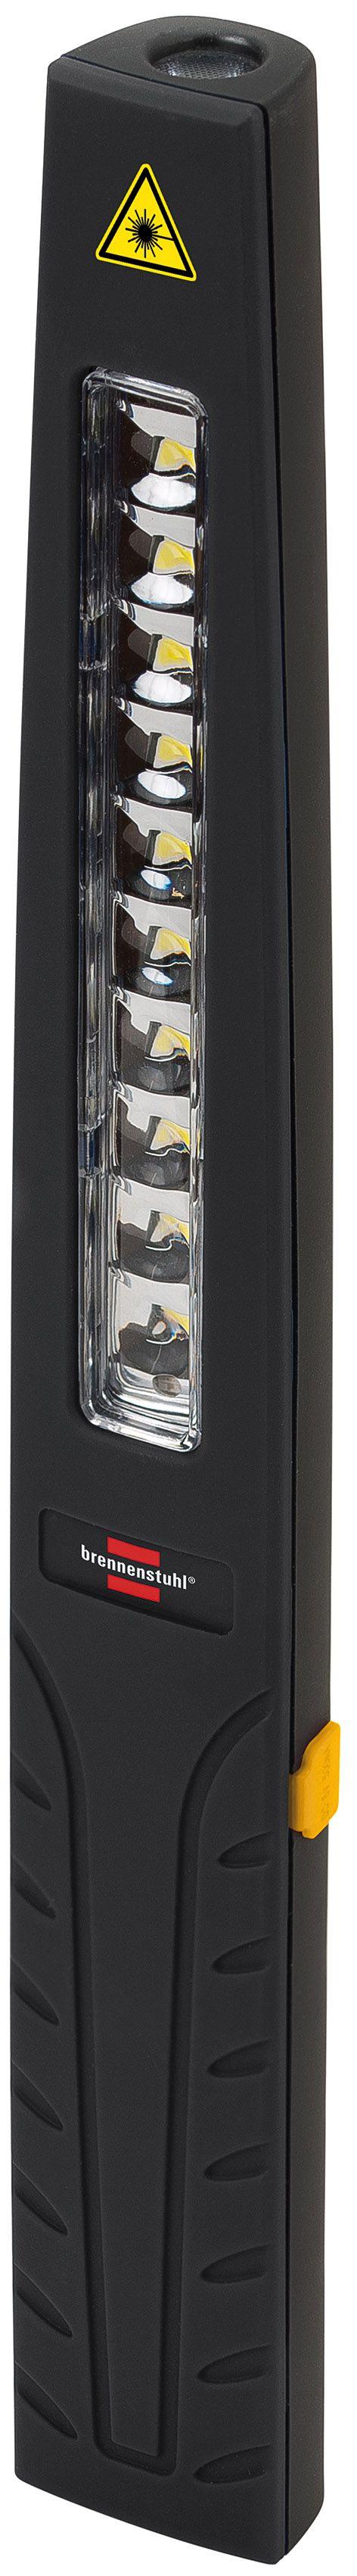 10 + 1 LED Akku Mini Stableuchte HL DA 101 M mit Netzteil, Kfz- Ladekabel und Micro USB